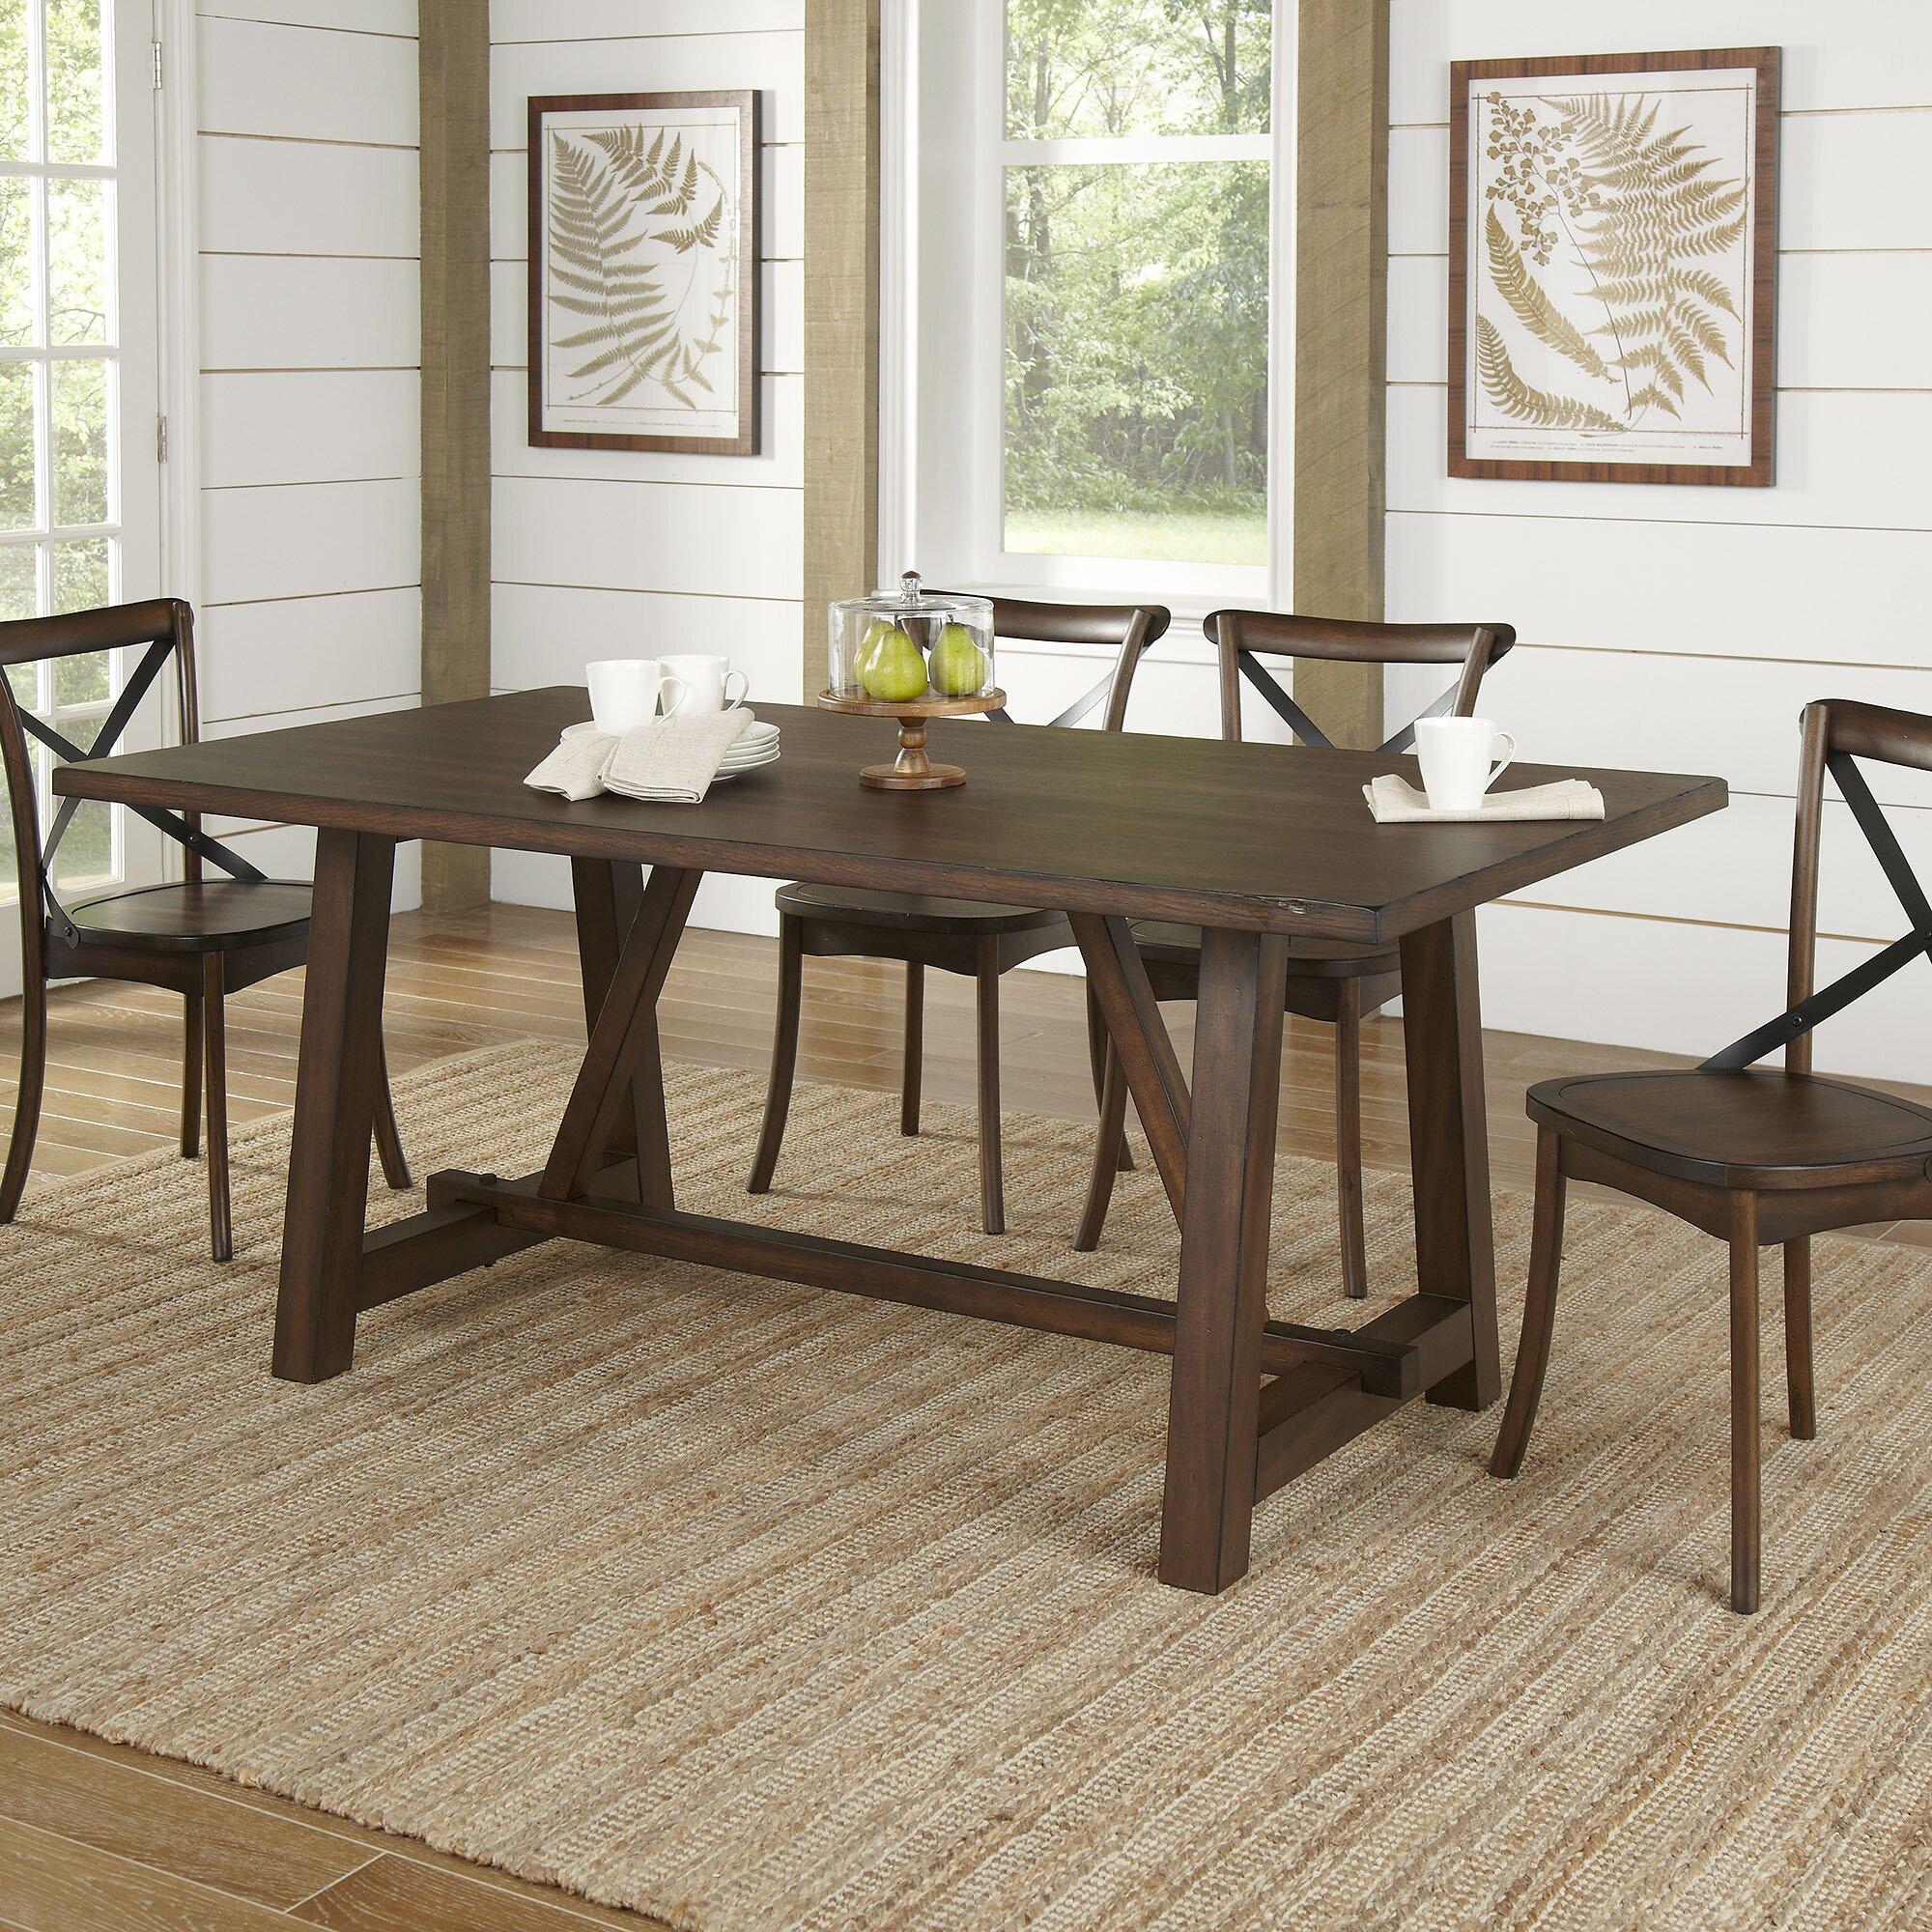 Modern rectangular dining table - Romney Rectangular Dining Table